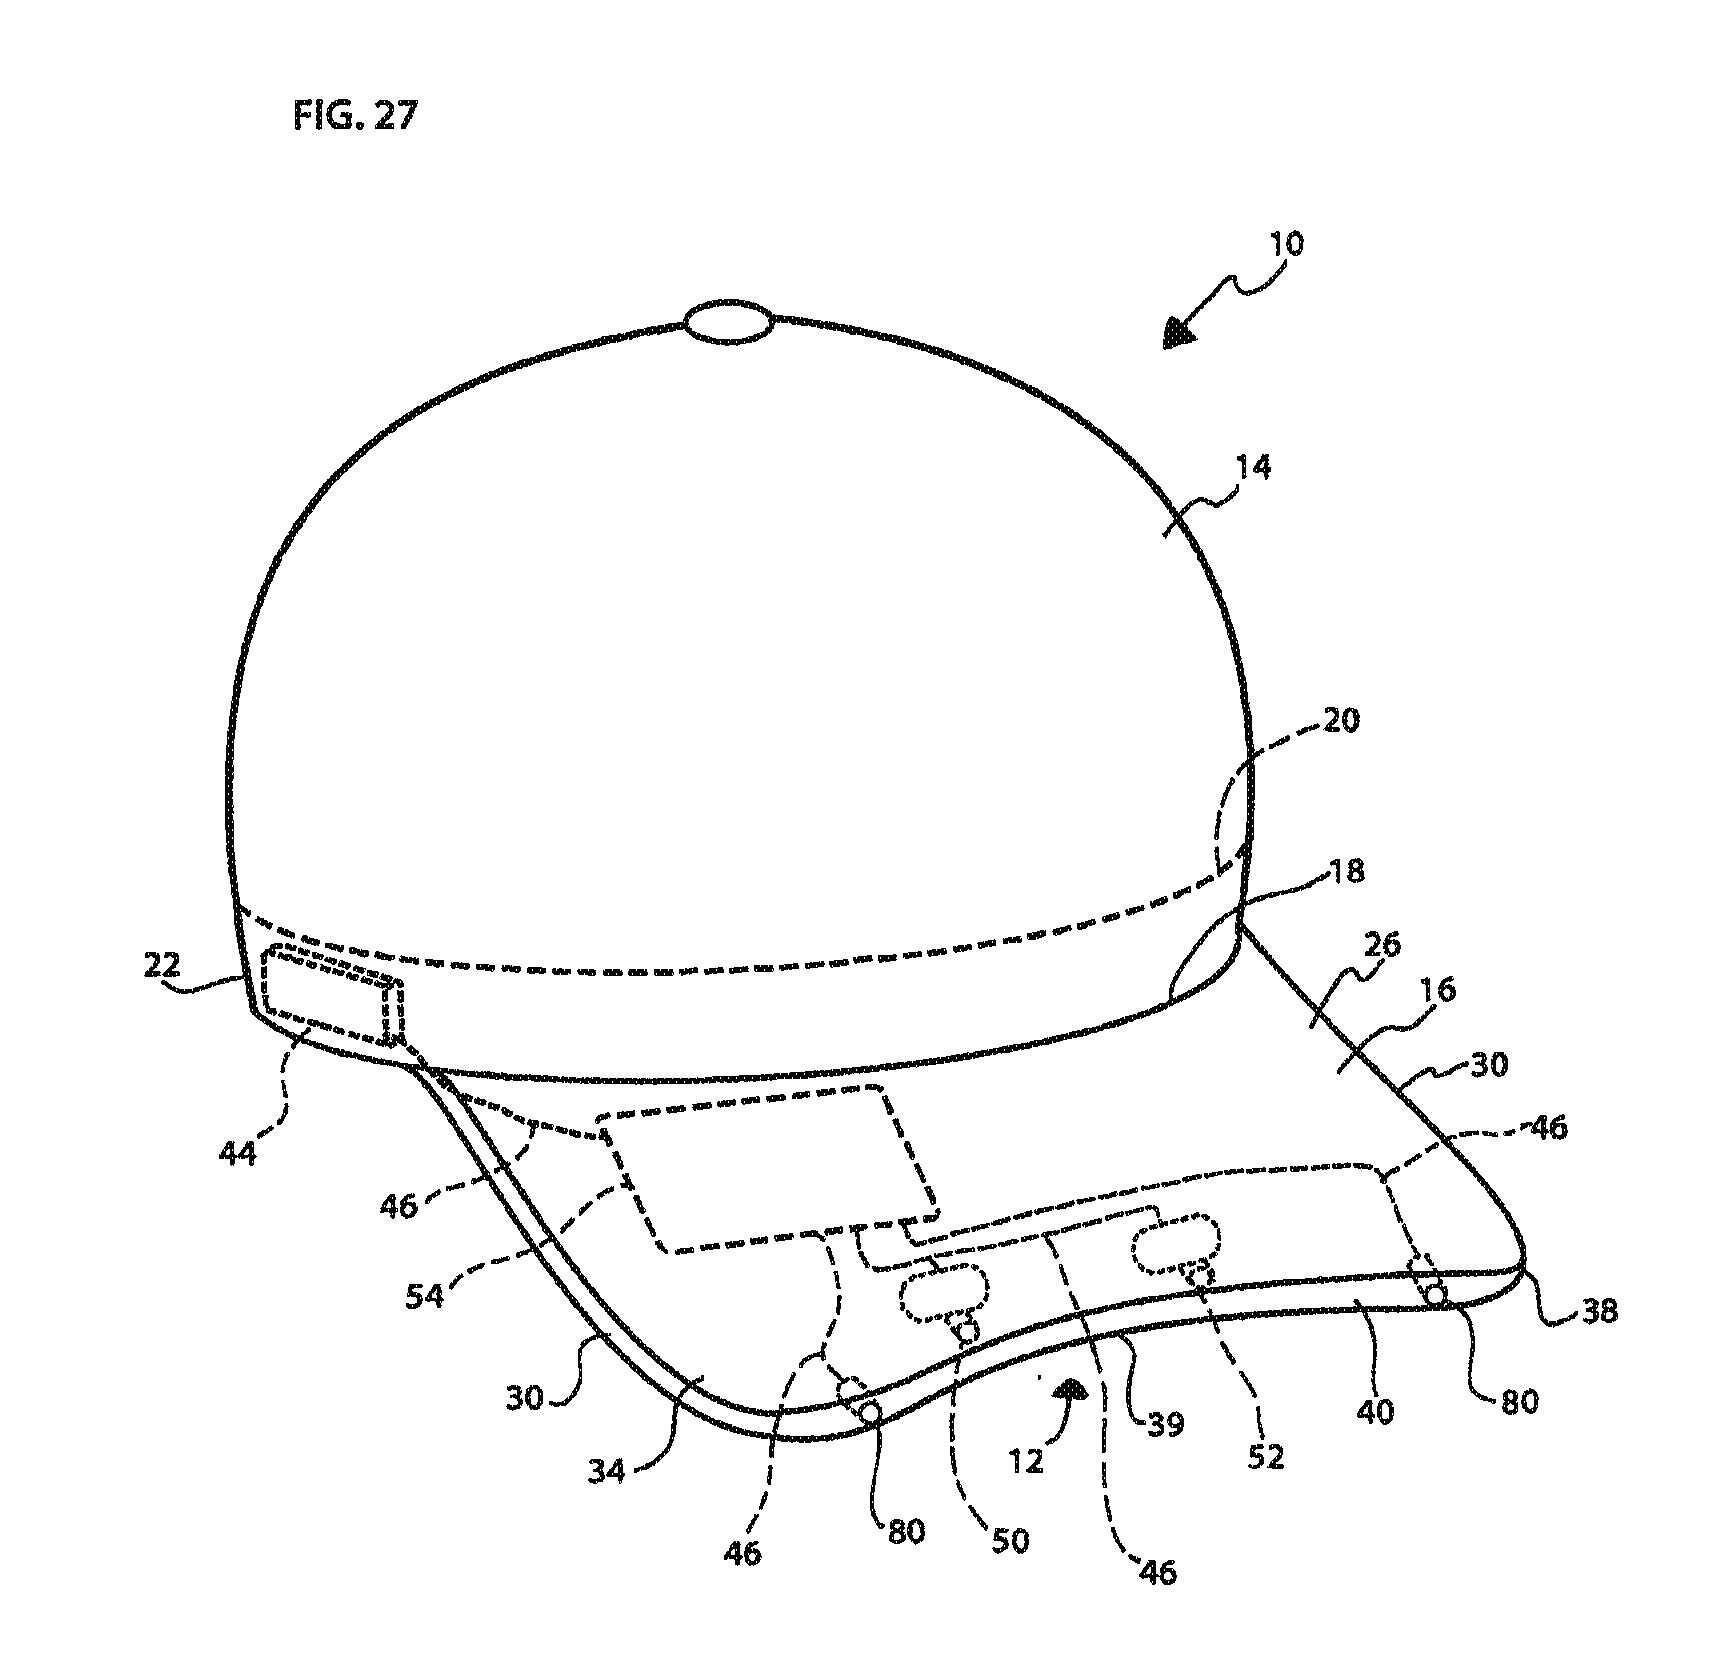 patent us 9 609 902 b2 JVC Home patent images